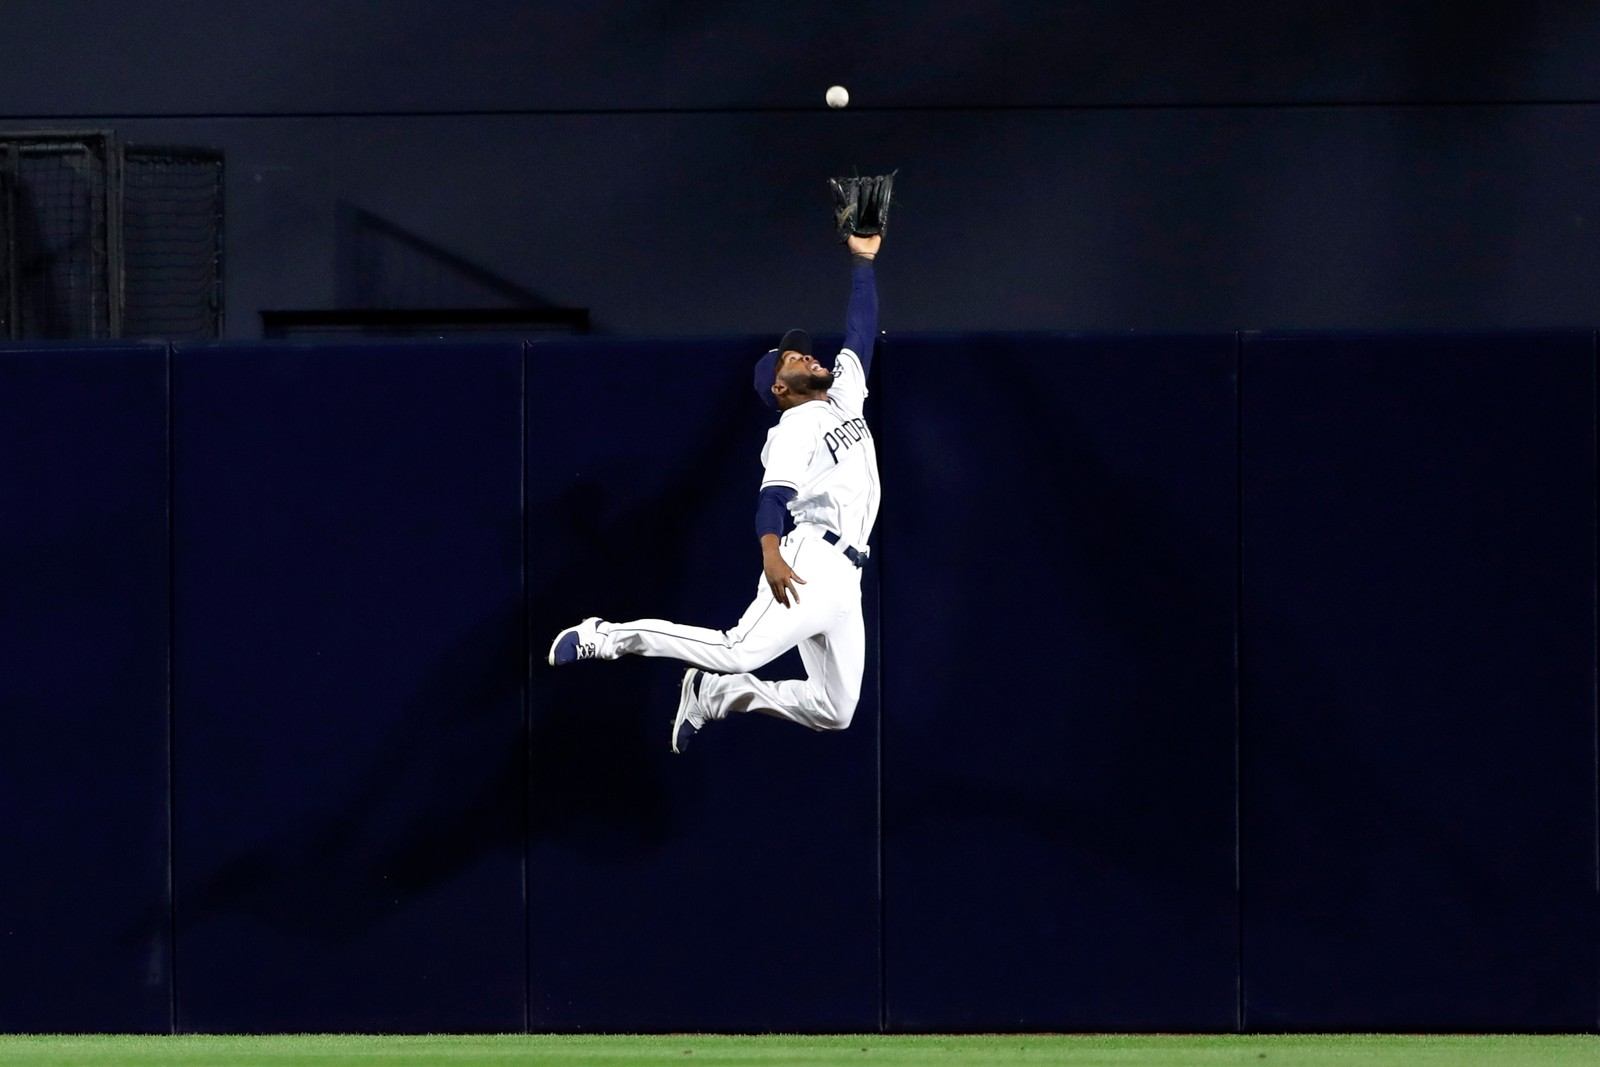 Høyt henger de, og sure er de, særlig når du ikke får fatt i dem. San Diegos Padres Manuel Margot prøver så godt han kan, men klarer ikke fange ballen.